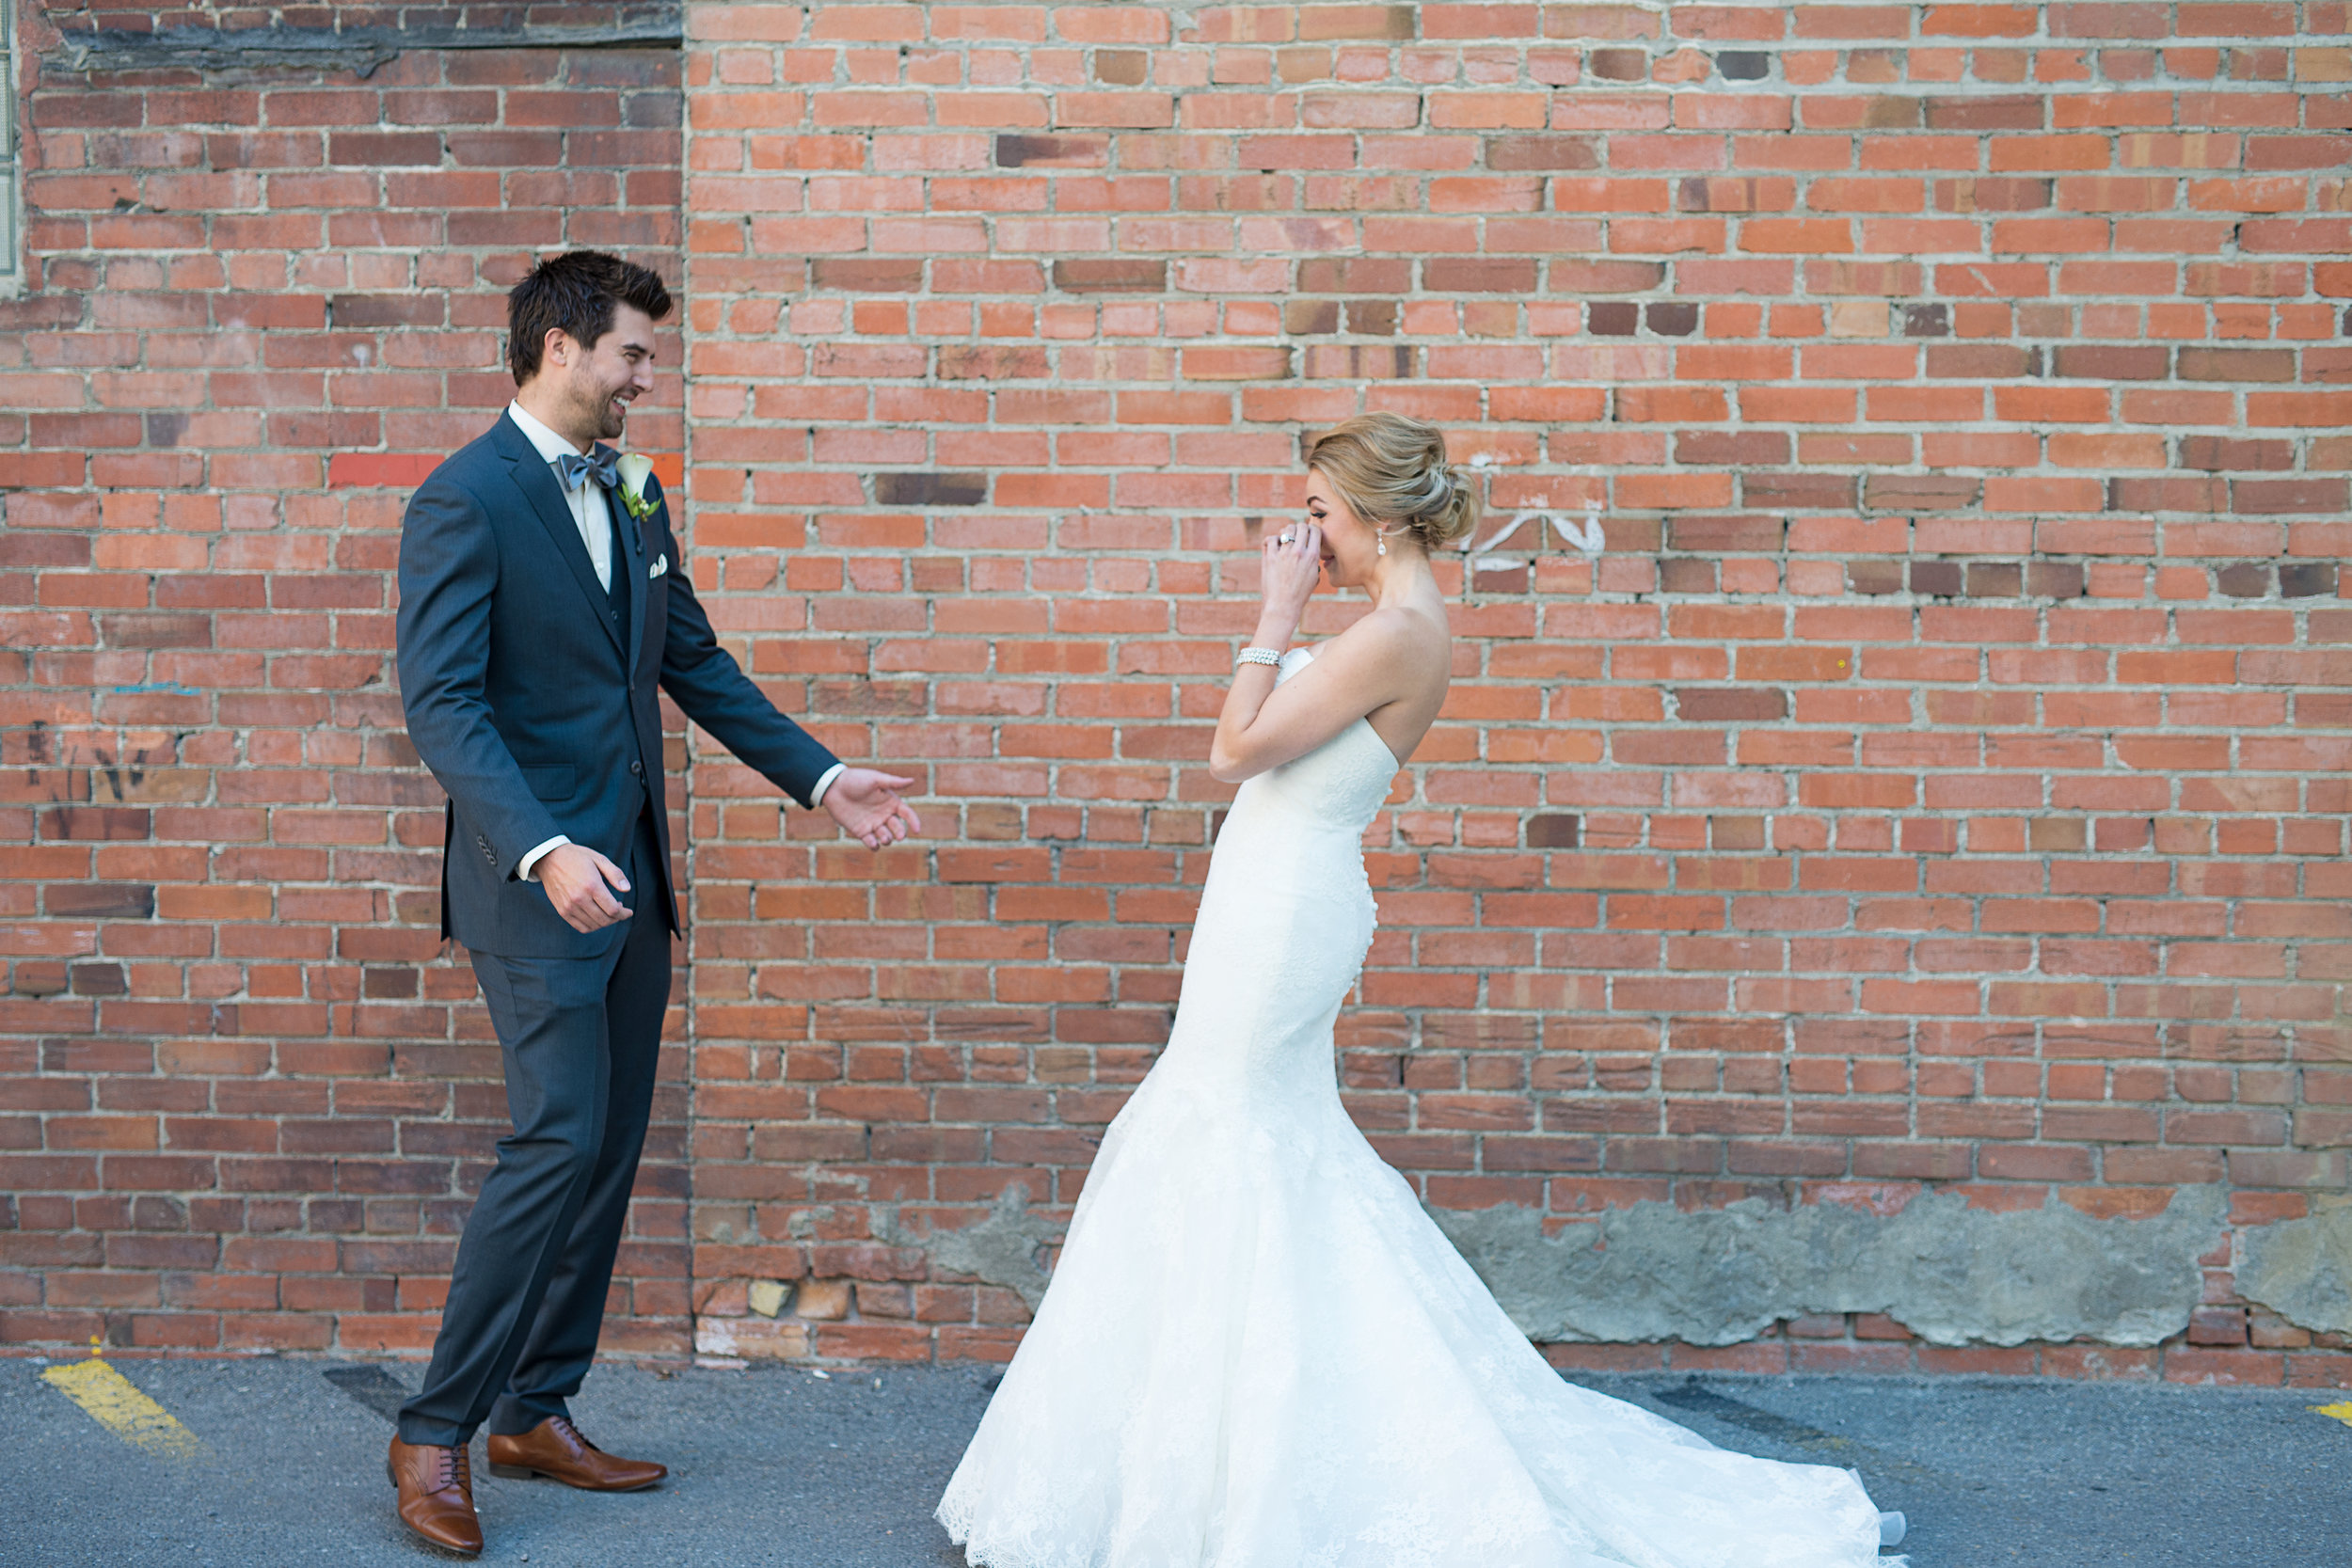 Calgary_Wedding_Photographer_Sanja_Scott_2016_HR 0205.jpg